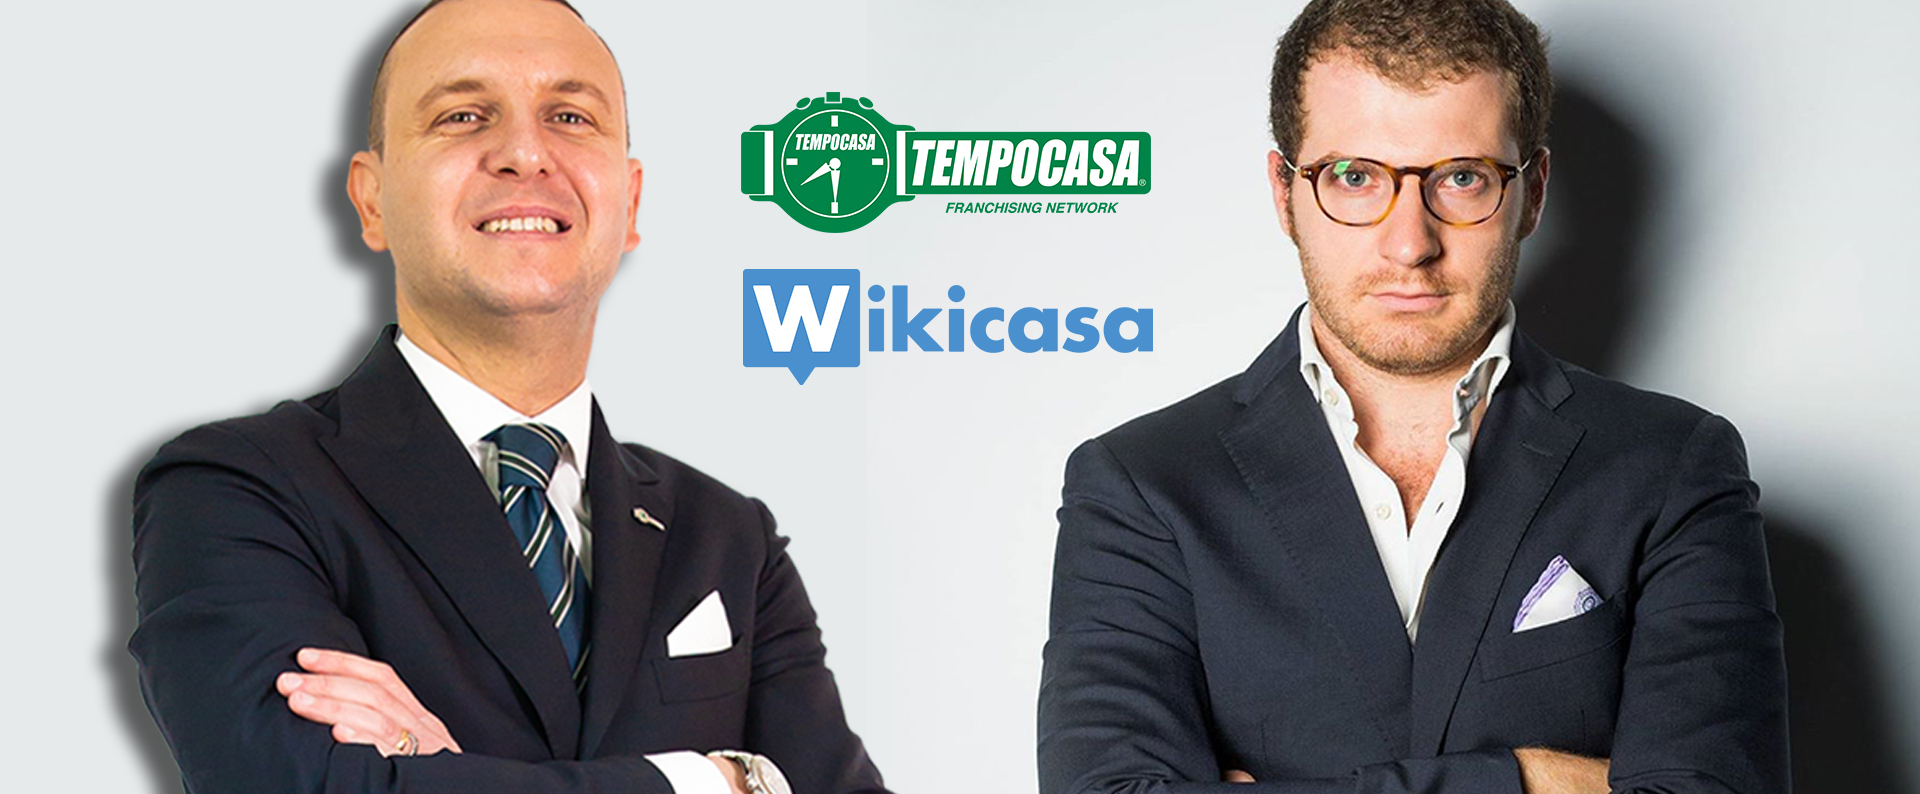 Tempocasa e Wikicasa